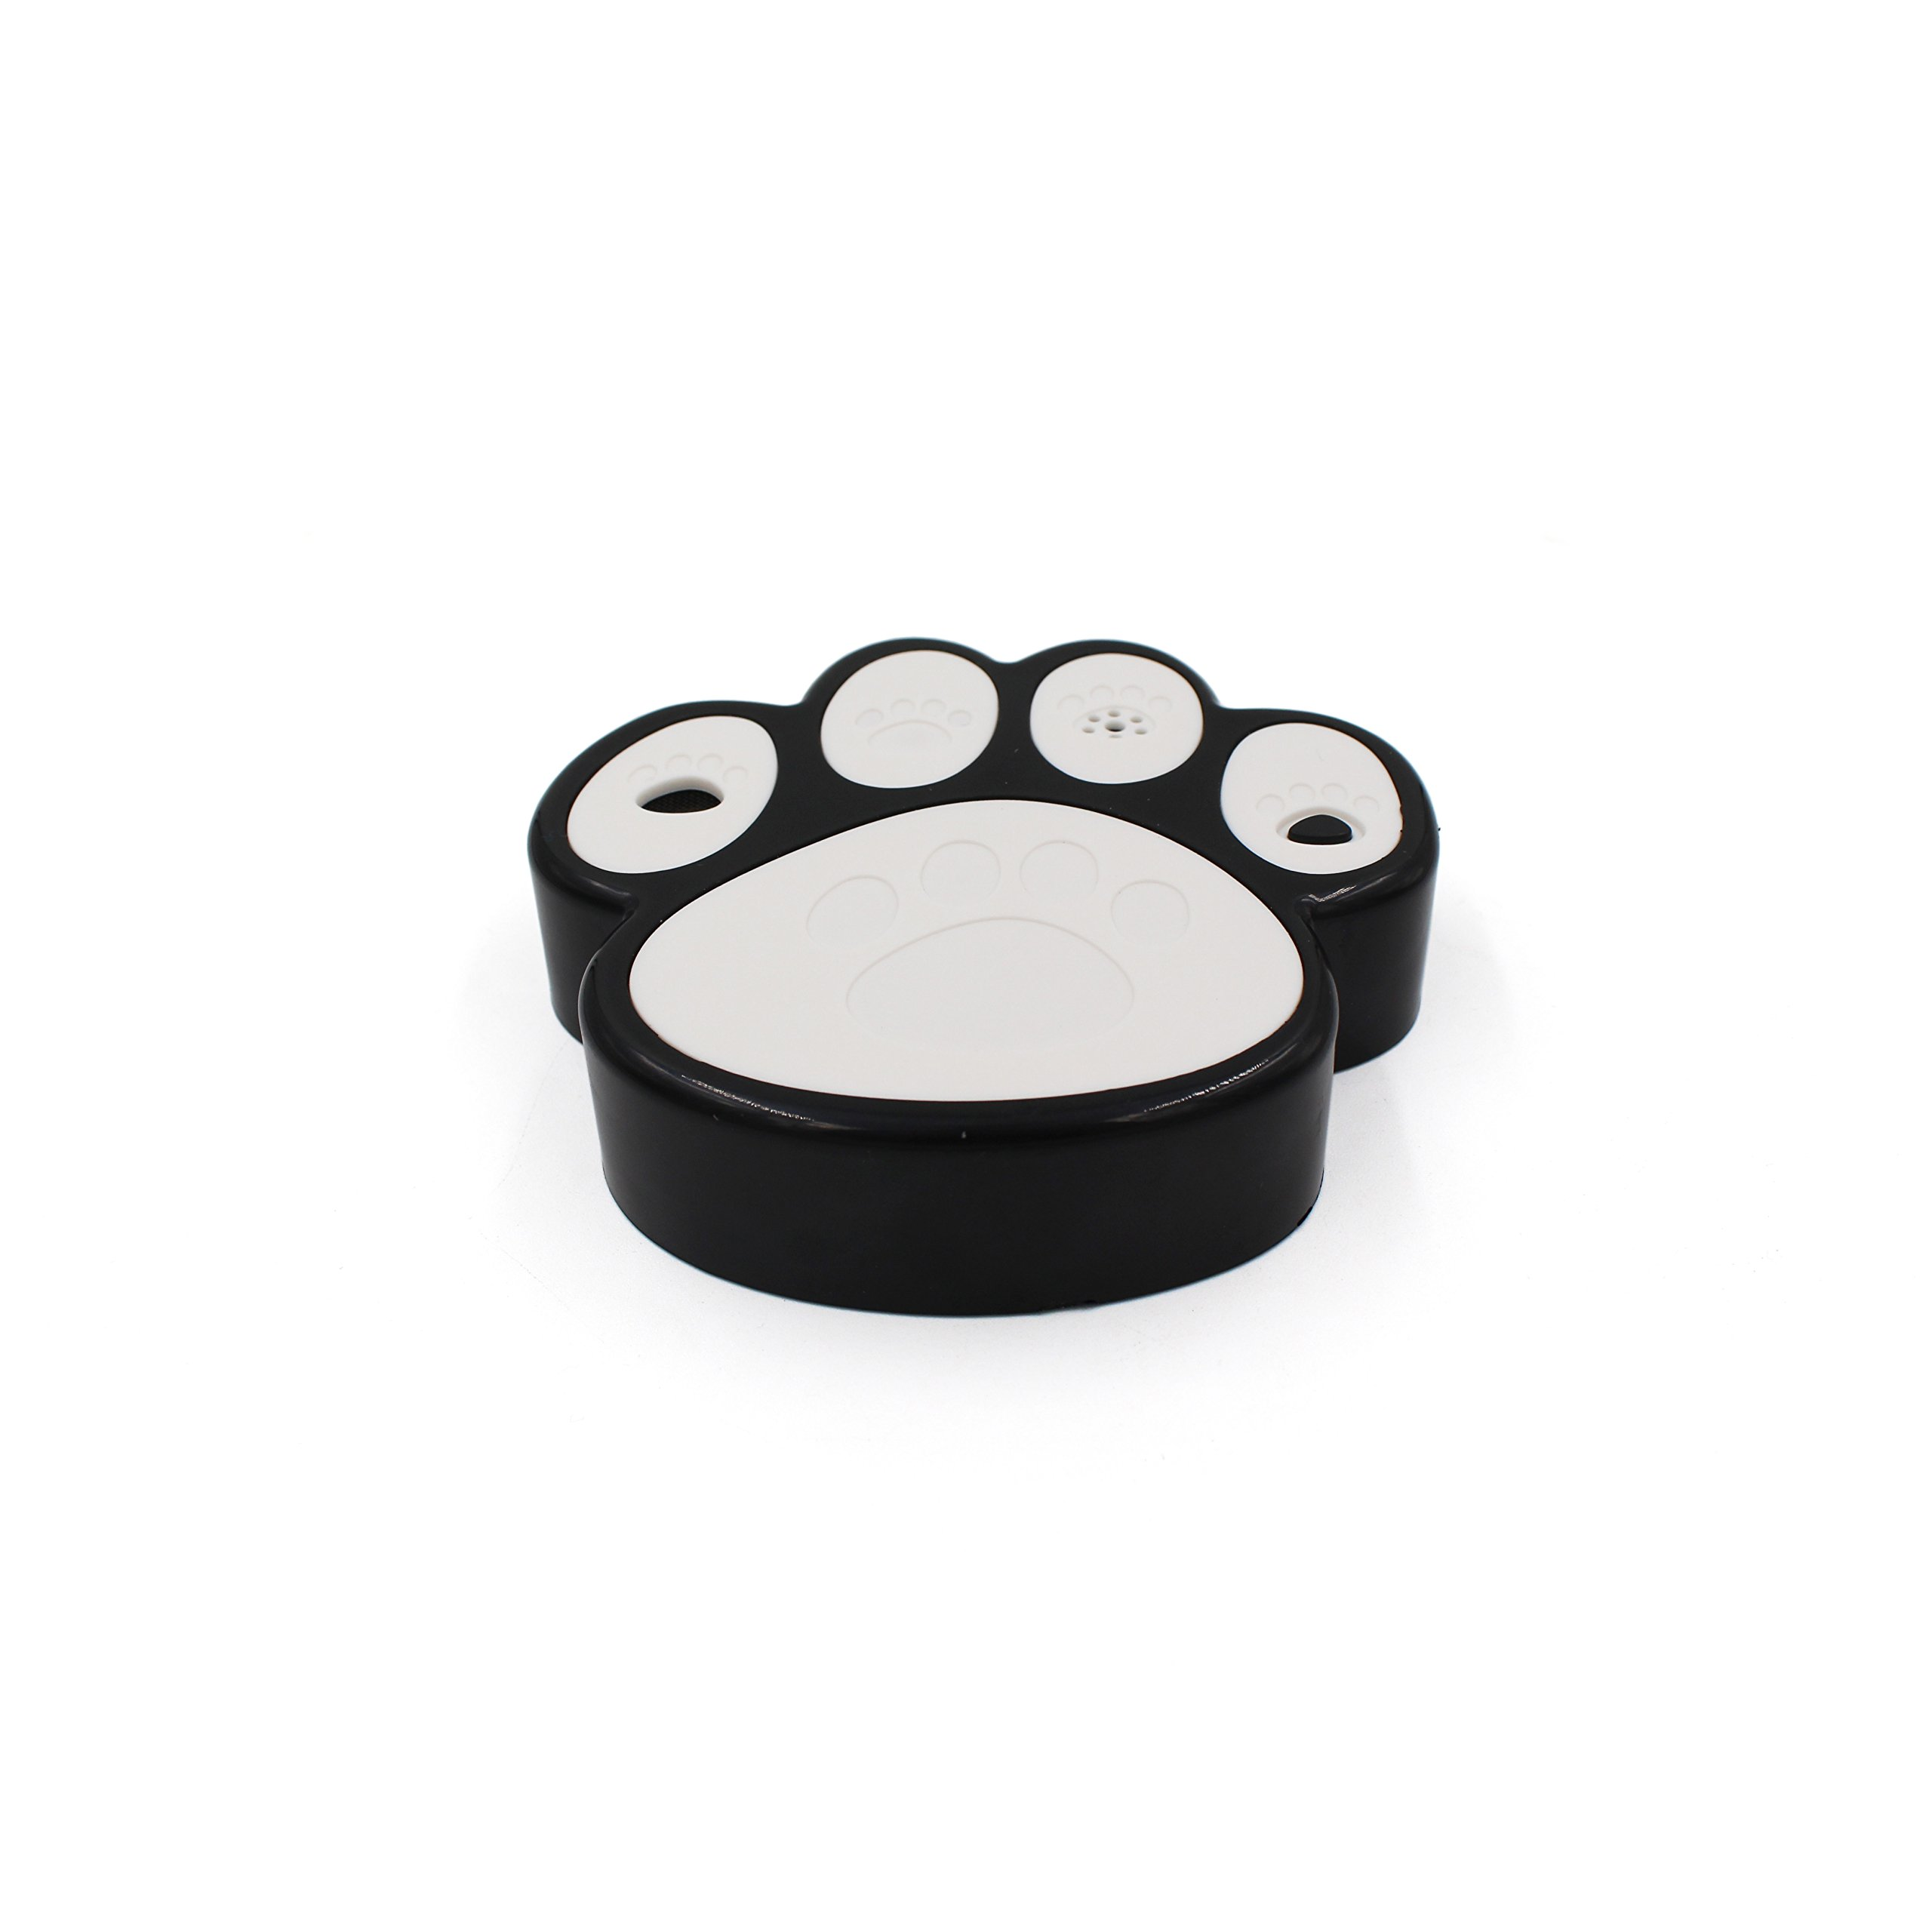 Original Manufacturer Ultrasonic Anti Barking Device   Bark Control Deterrents   Training Tool   Stop Barking, No Barking   Safe for Small/Medium/Large Dogs   Outdoor/Indoor uses by Original Manufacturer